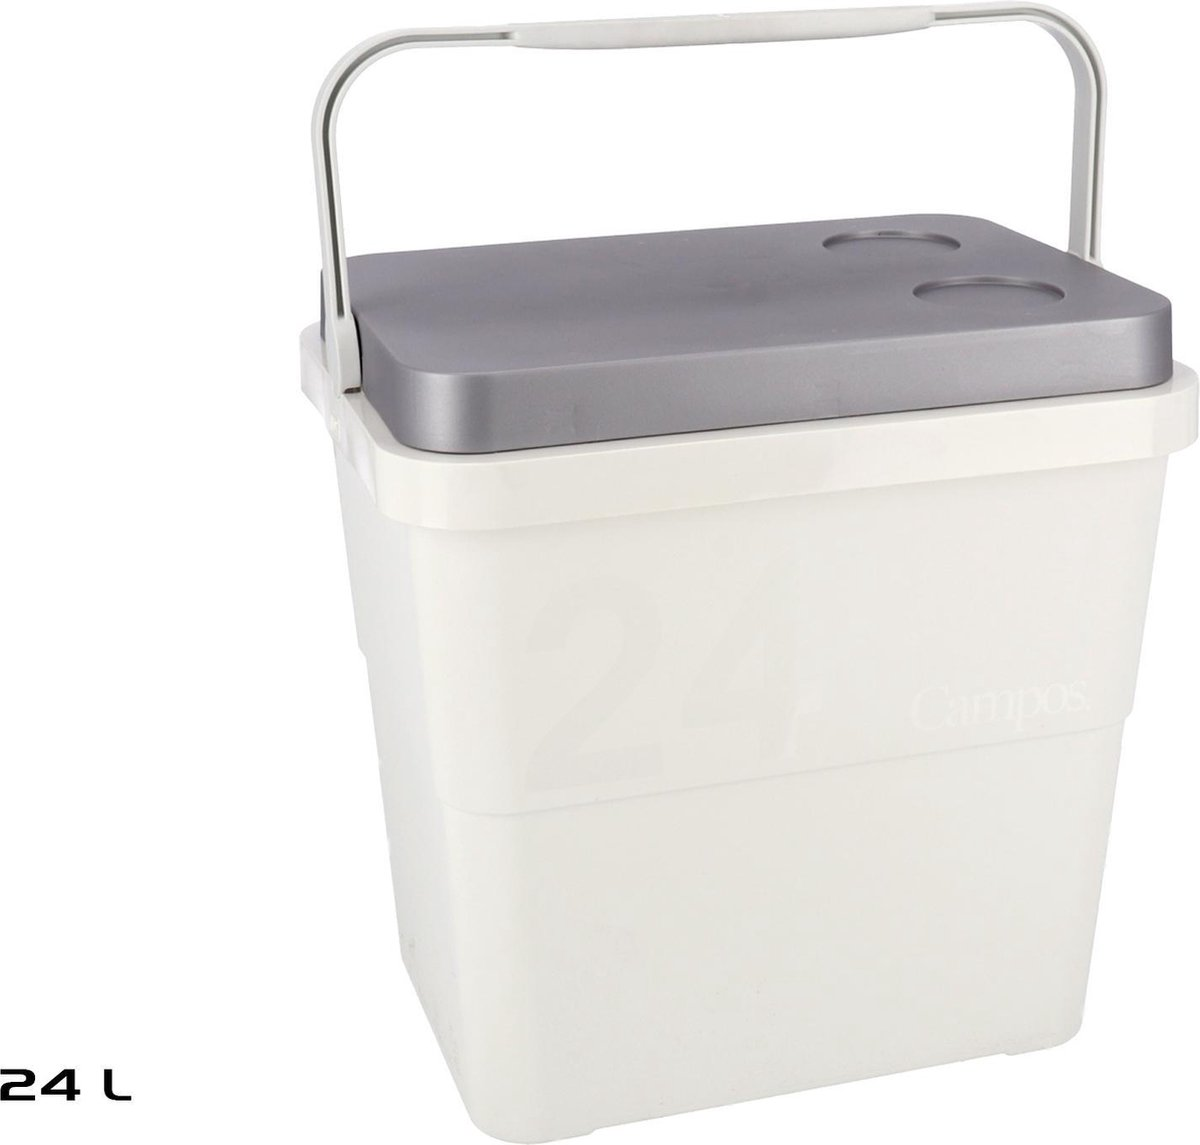 Koelbox - 39,5x29,5x108cm - 24L - Strandkoelbox - Grijs kopen